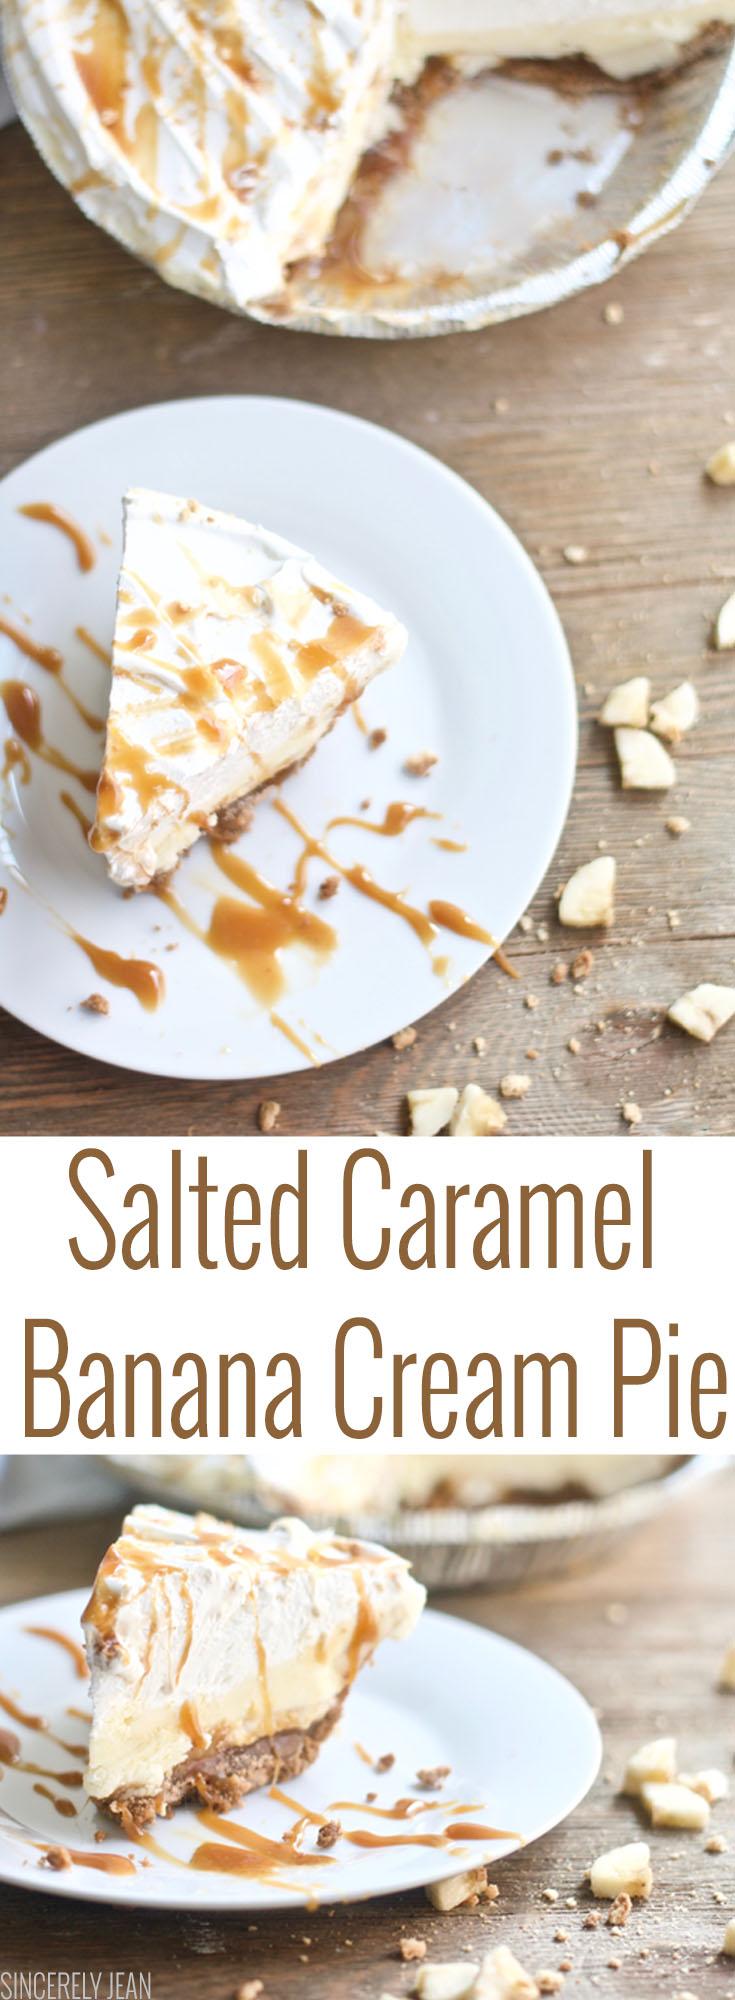 Salted Caramel Banana Cream Pie homemade, easy, pudding, pie, fall, thanksgiving, baking, dessert, recipe